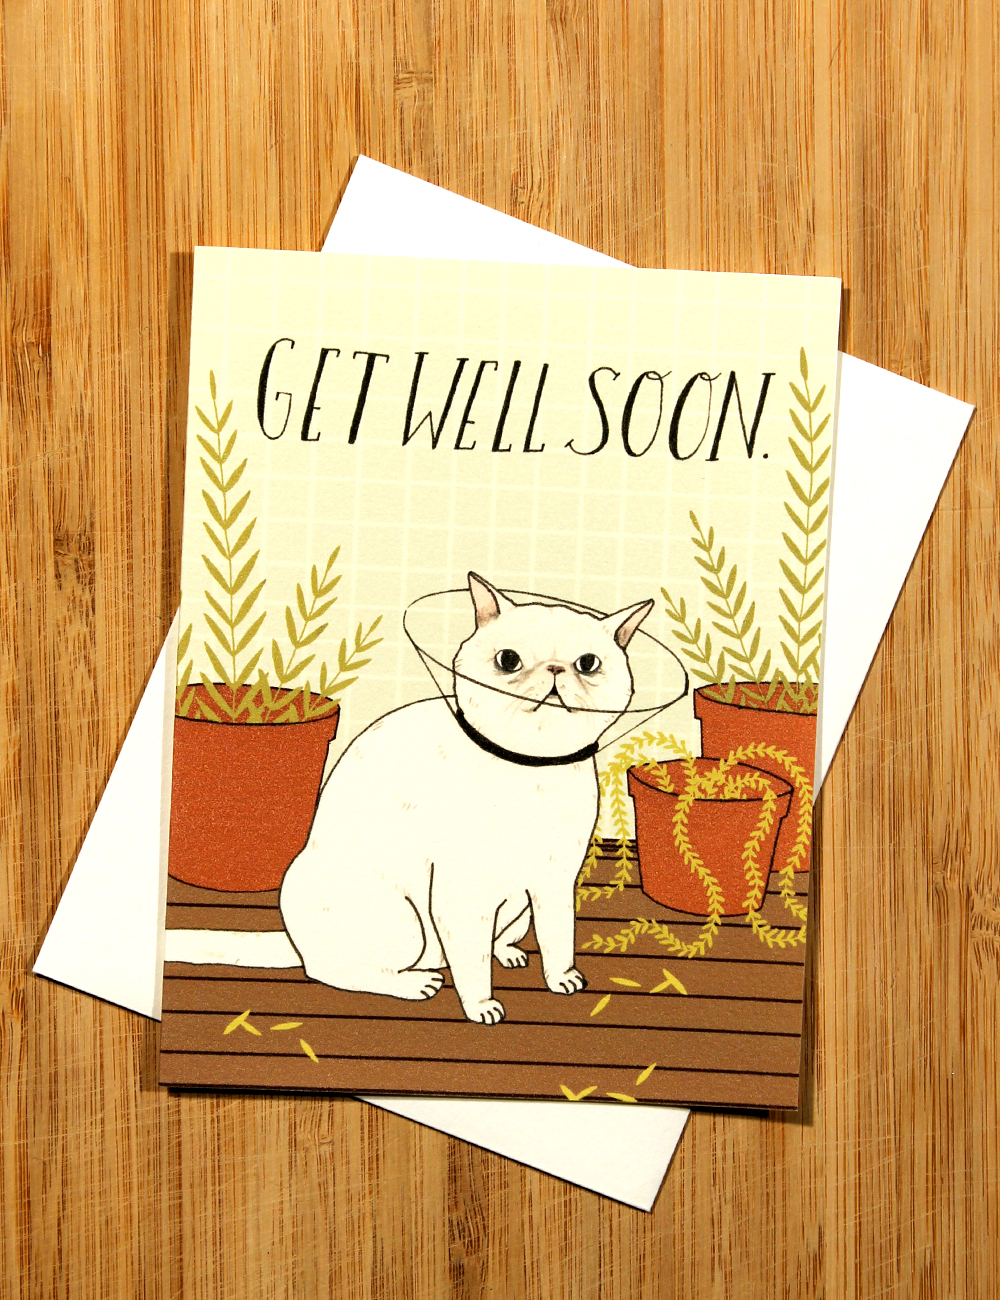 Getwellcatcard.jpg